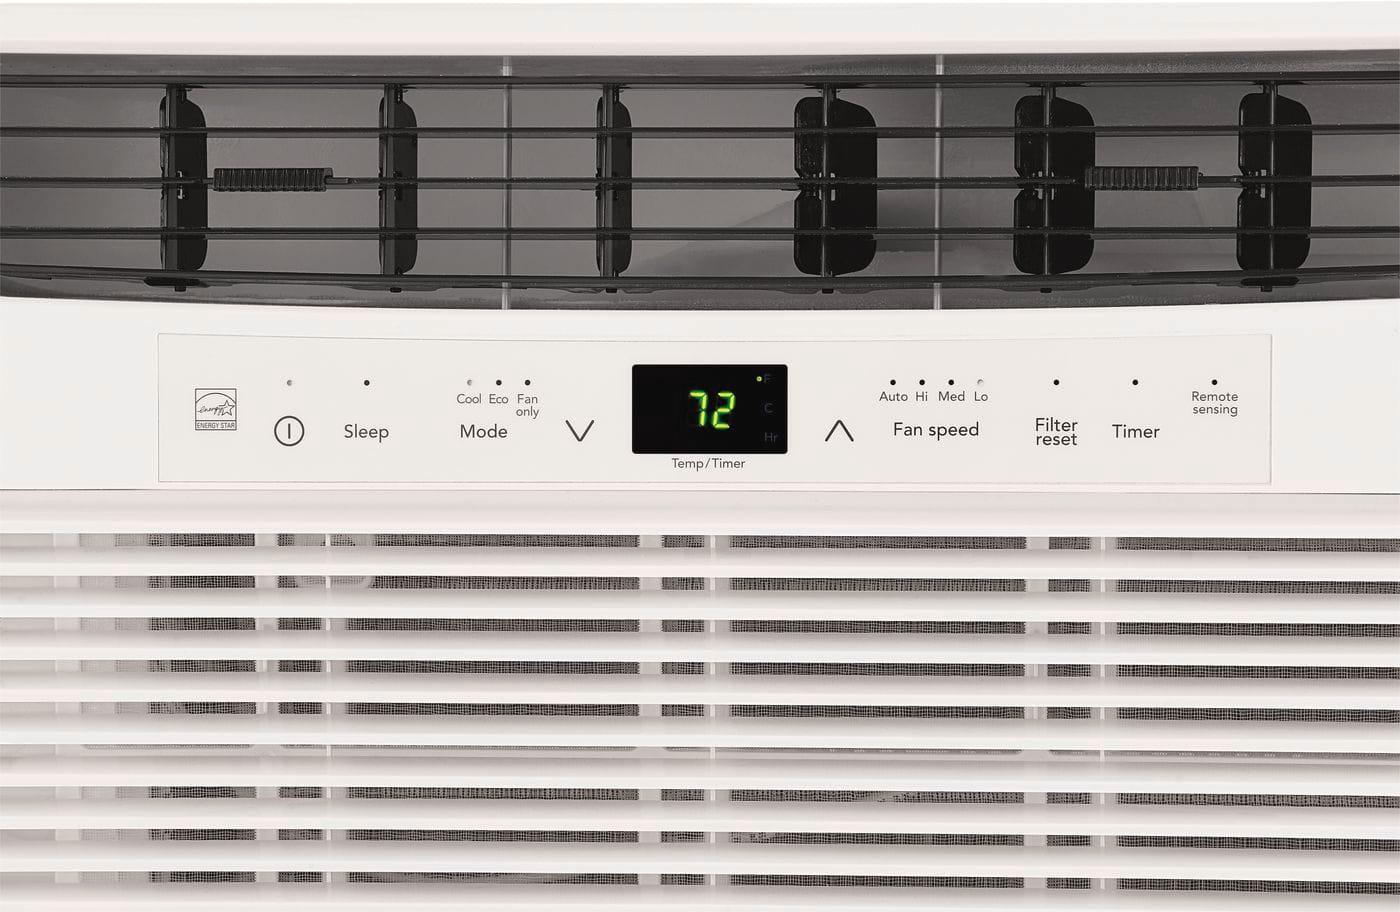 Model: FFRE053ZA1 | Frigidaire 5,000 BTU Window-Mounted Room Air Conditioner